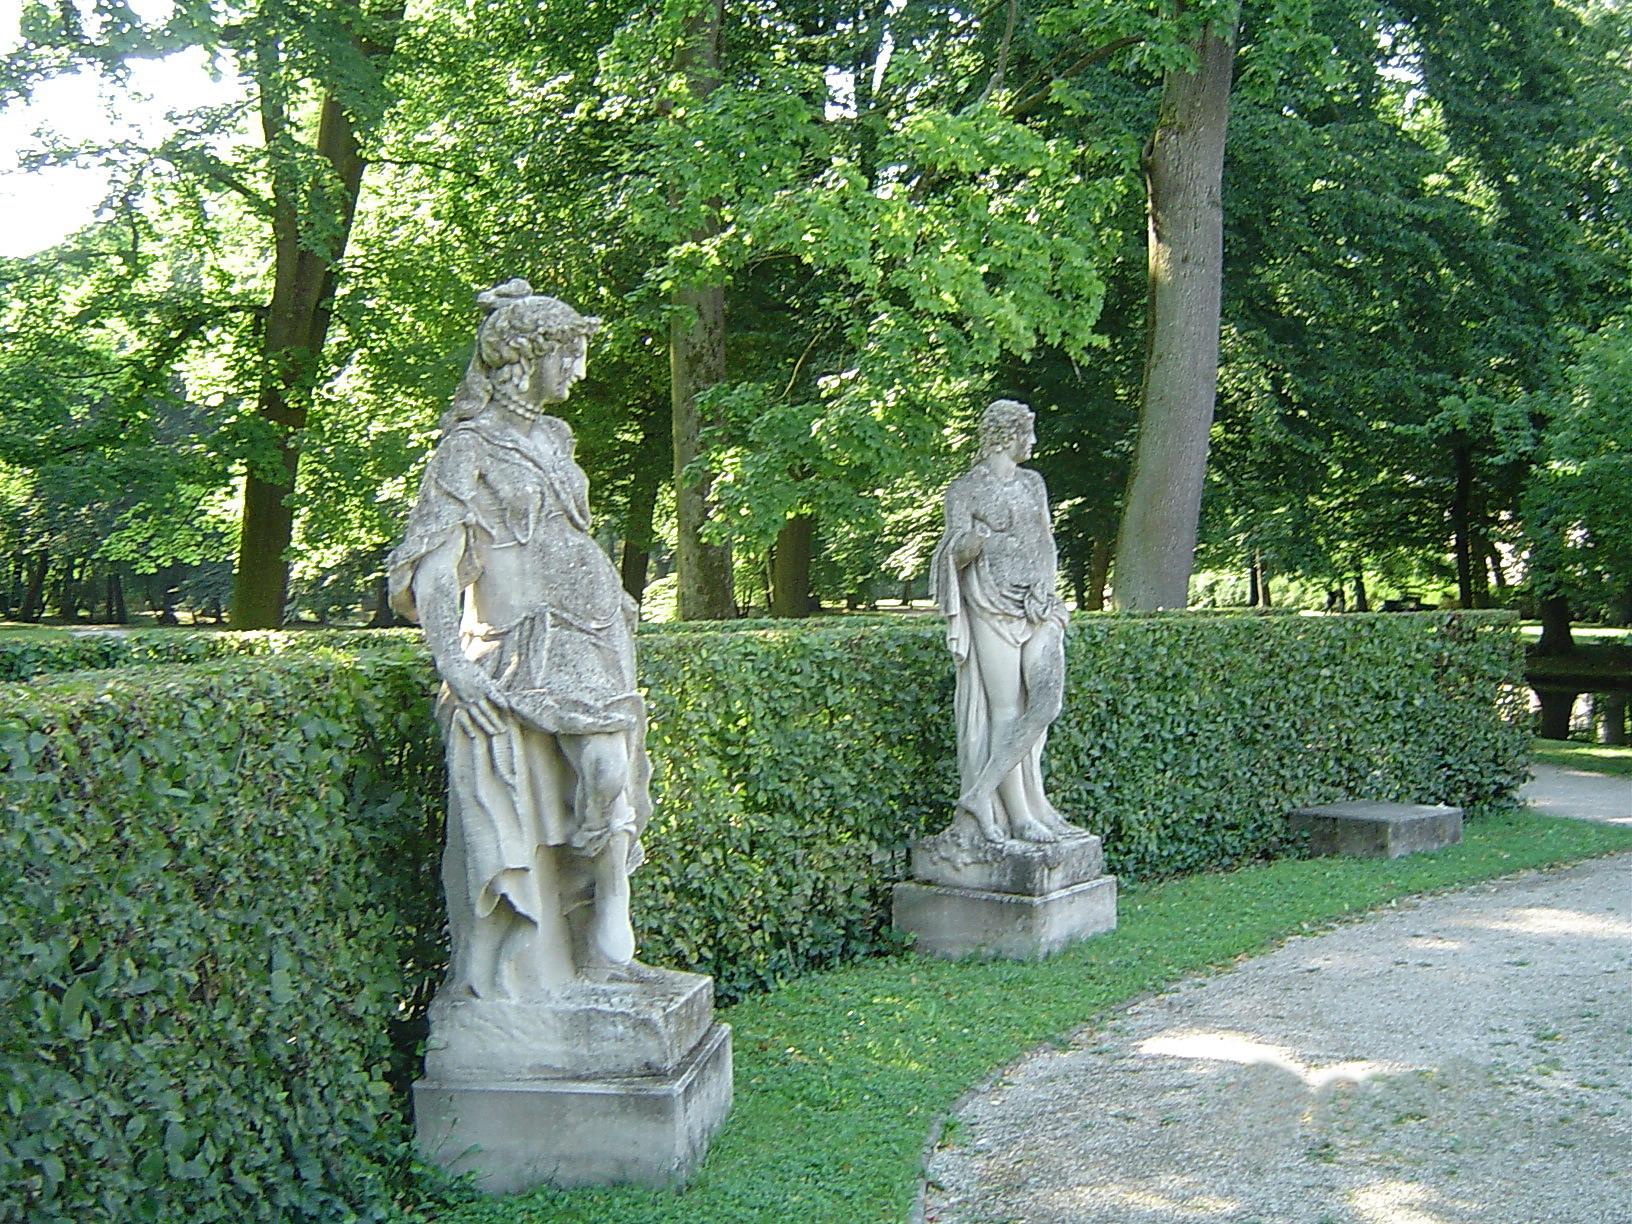 Filebayreuth Hofgarten Neues Schloss Garten Skulpturen Kopien